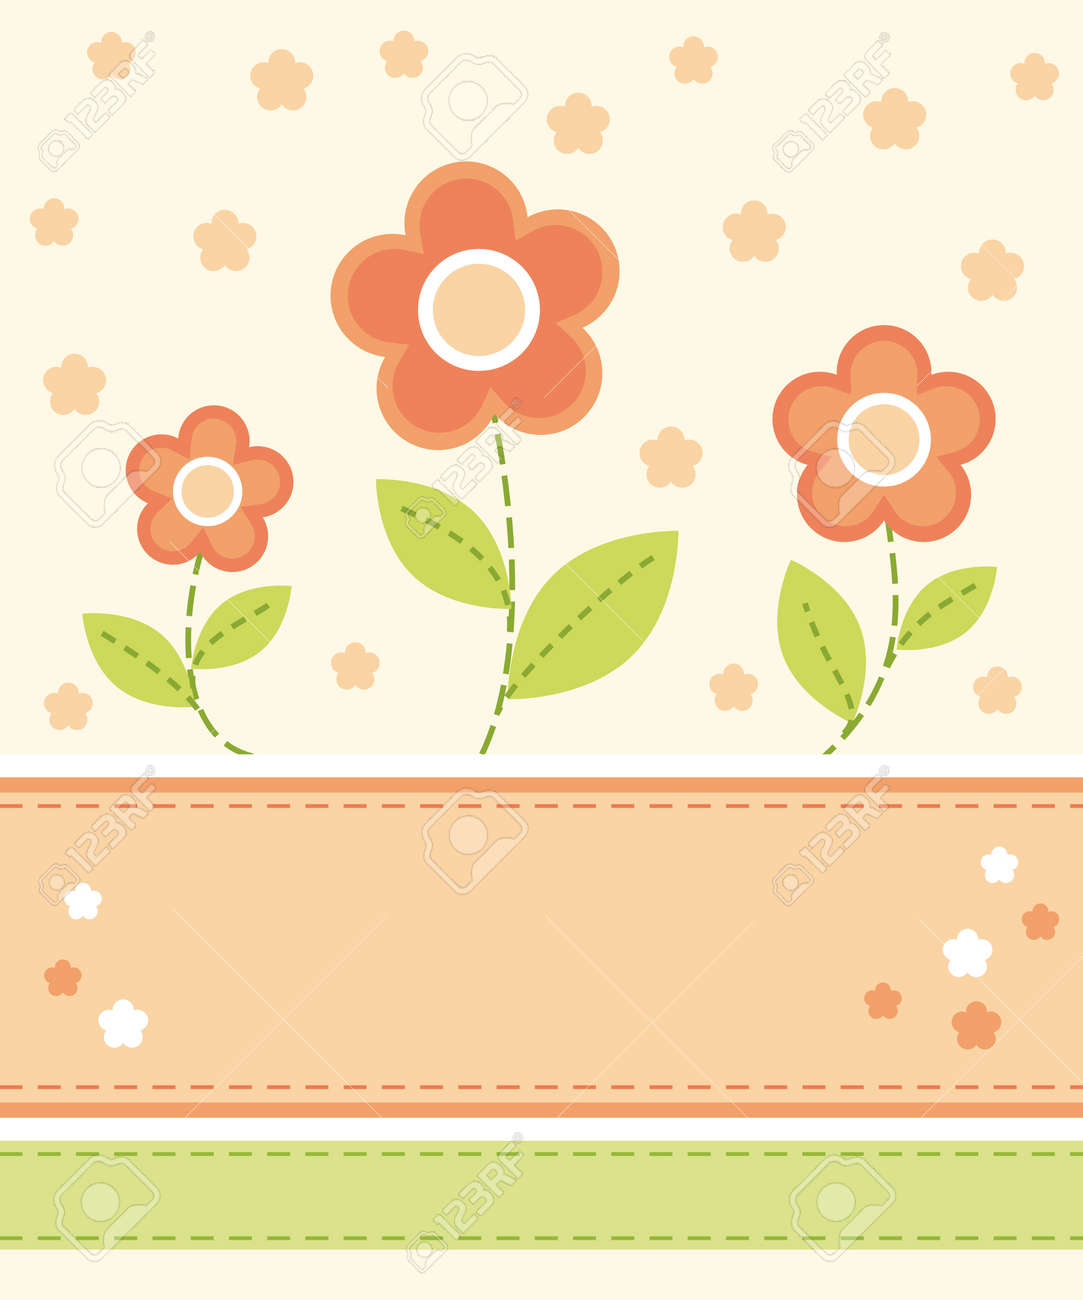 Flower card design Stock Vector - 10928213